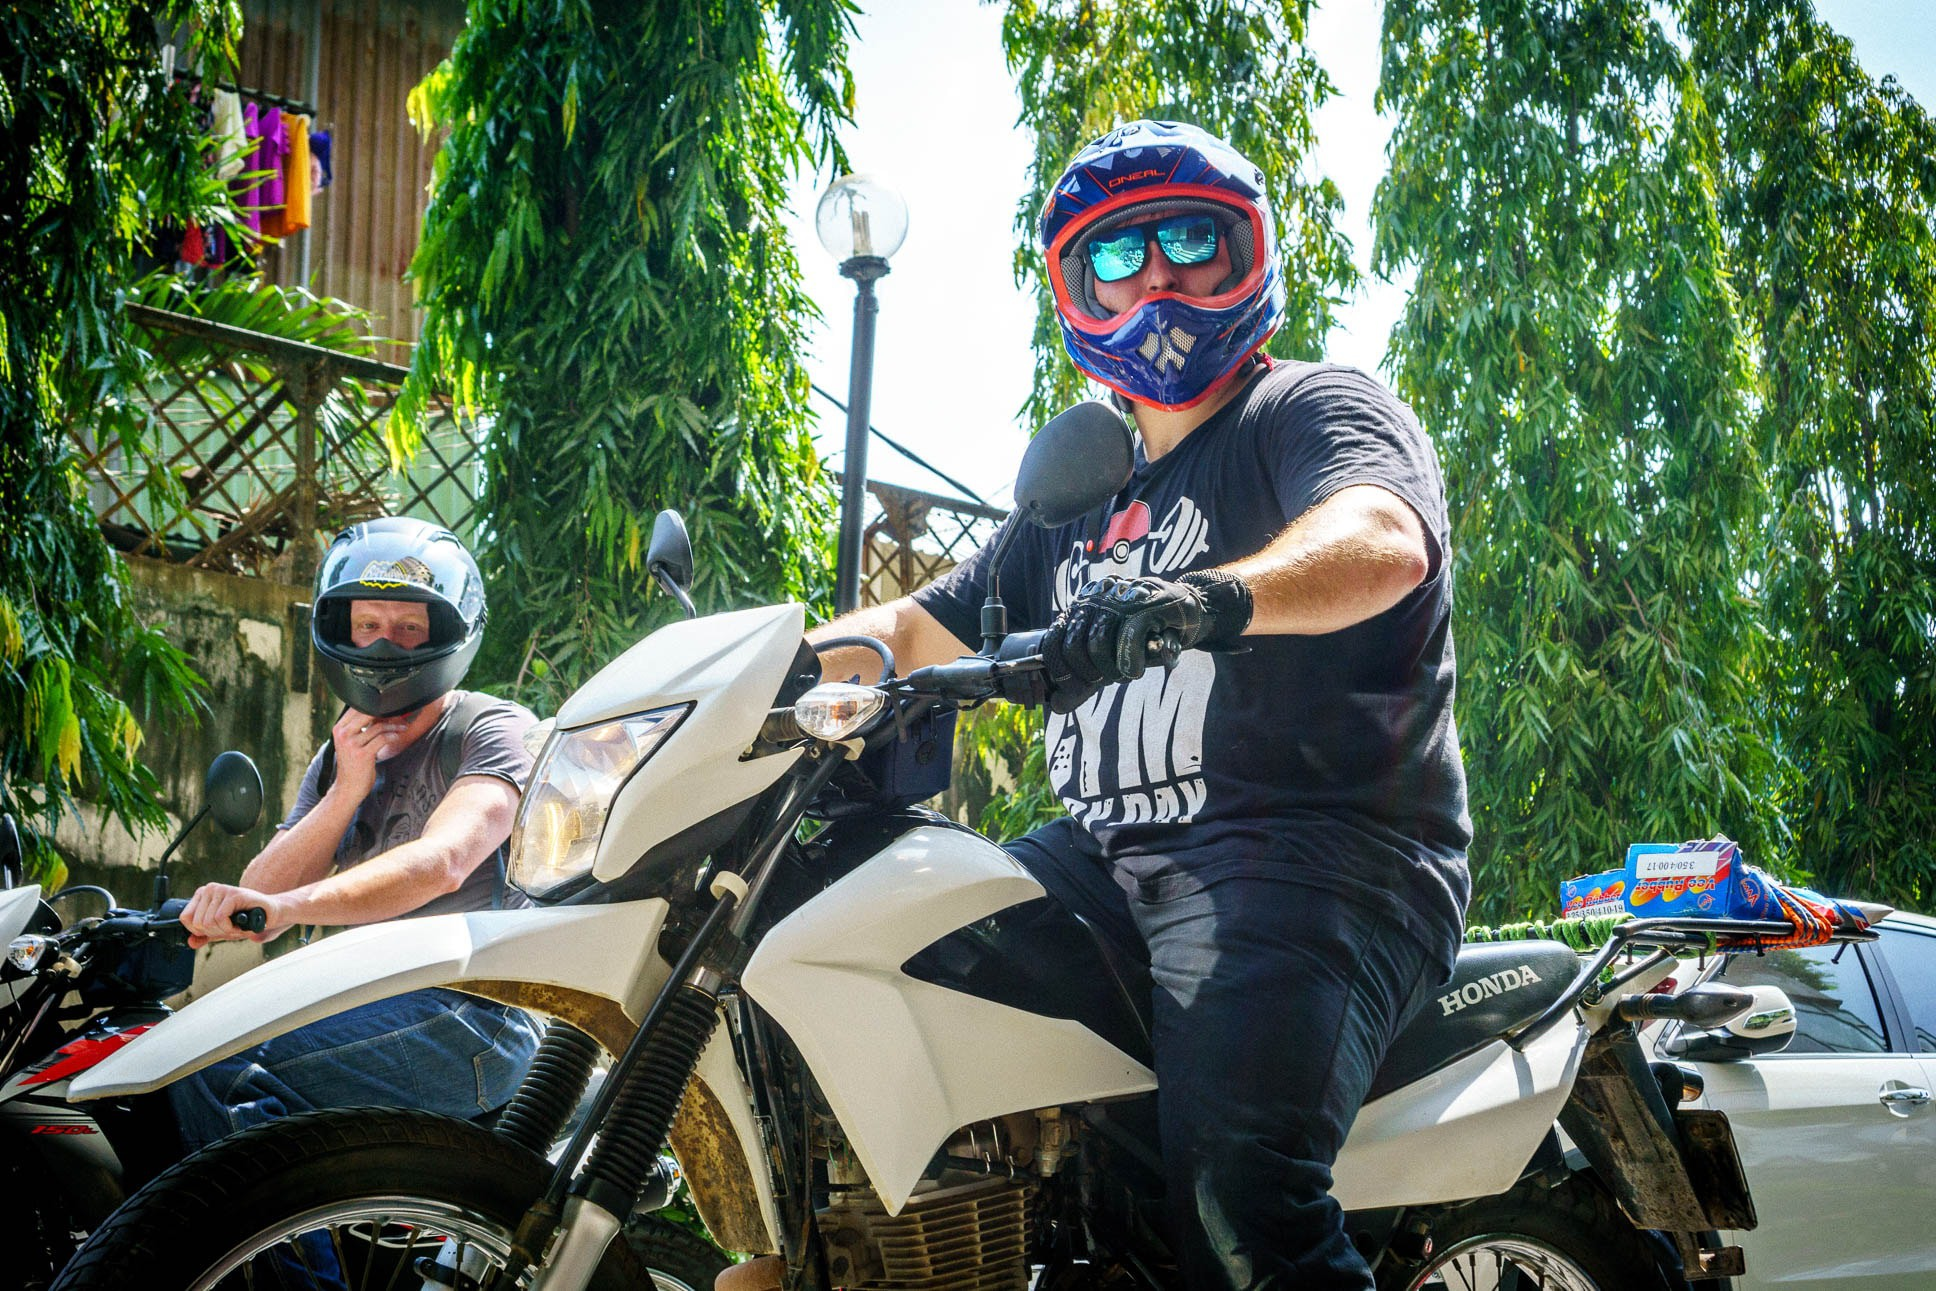 More satisfied Tigit customers | Courtesy of Tigit Motorbikes